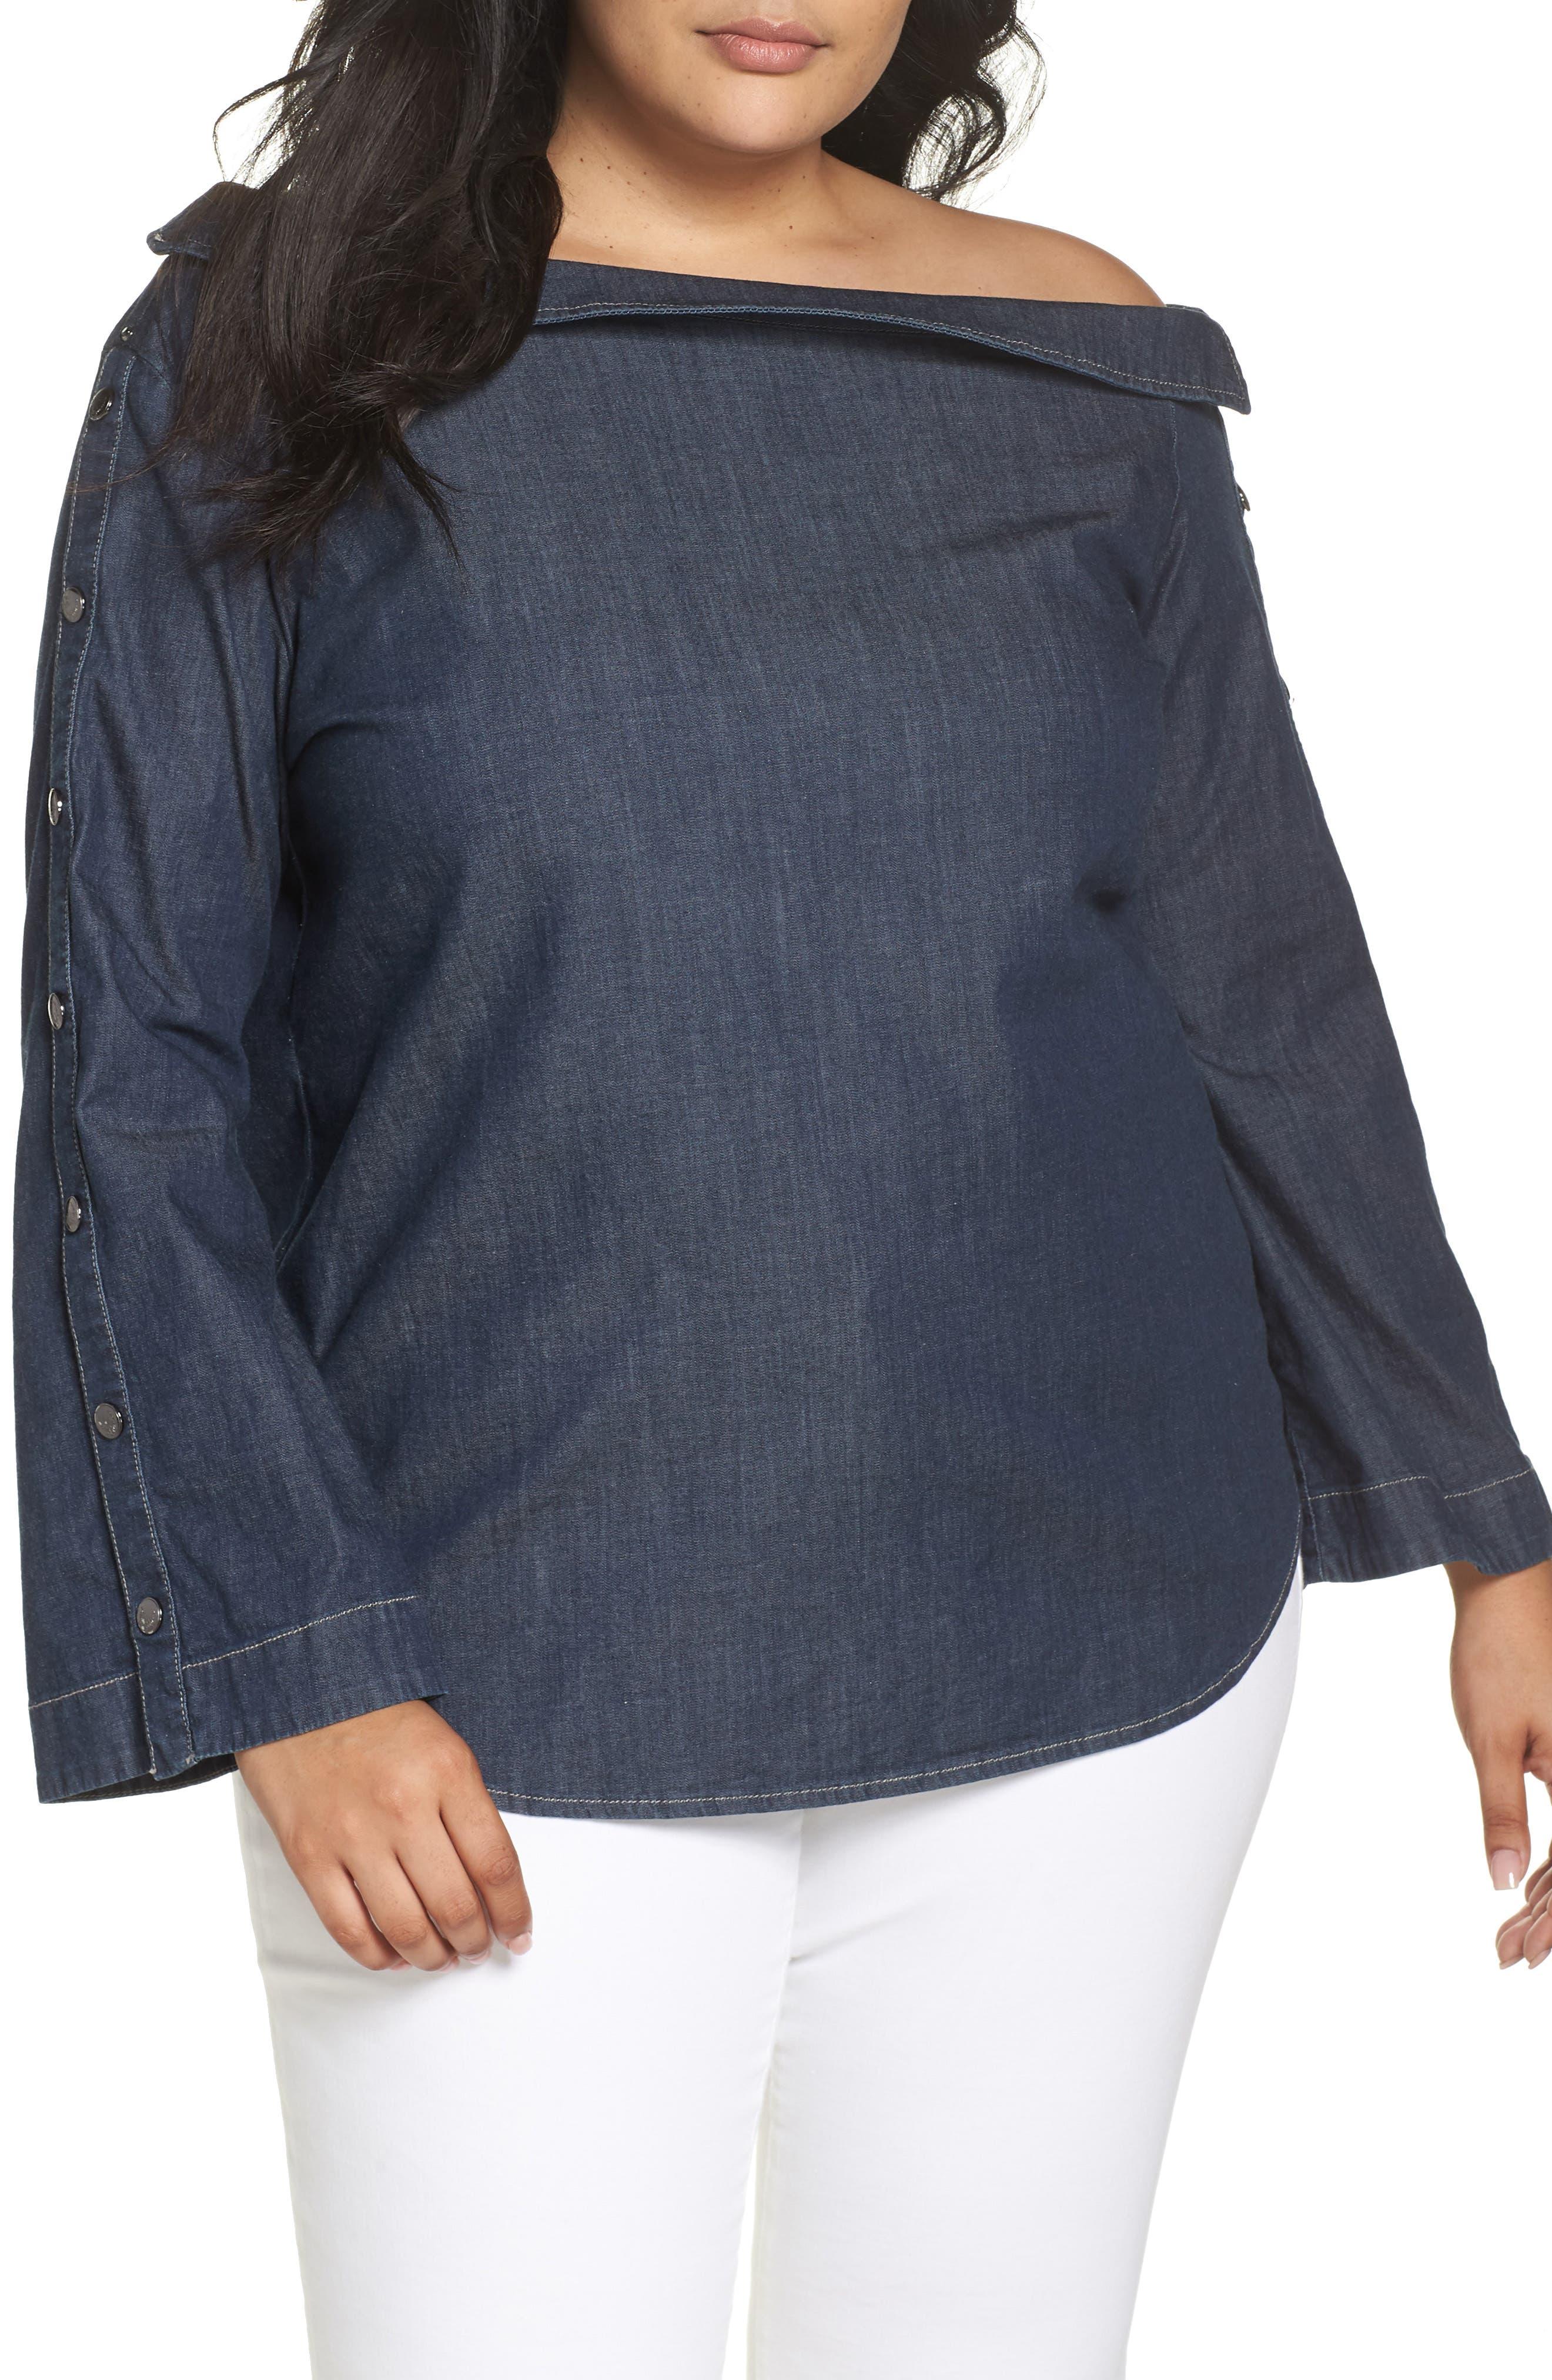 ASHLEY GRAHAM X MARINA RINALDI Banchisa Off-Shoulder Top in Navy Blue 2